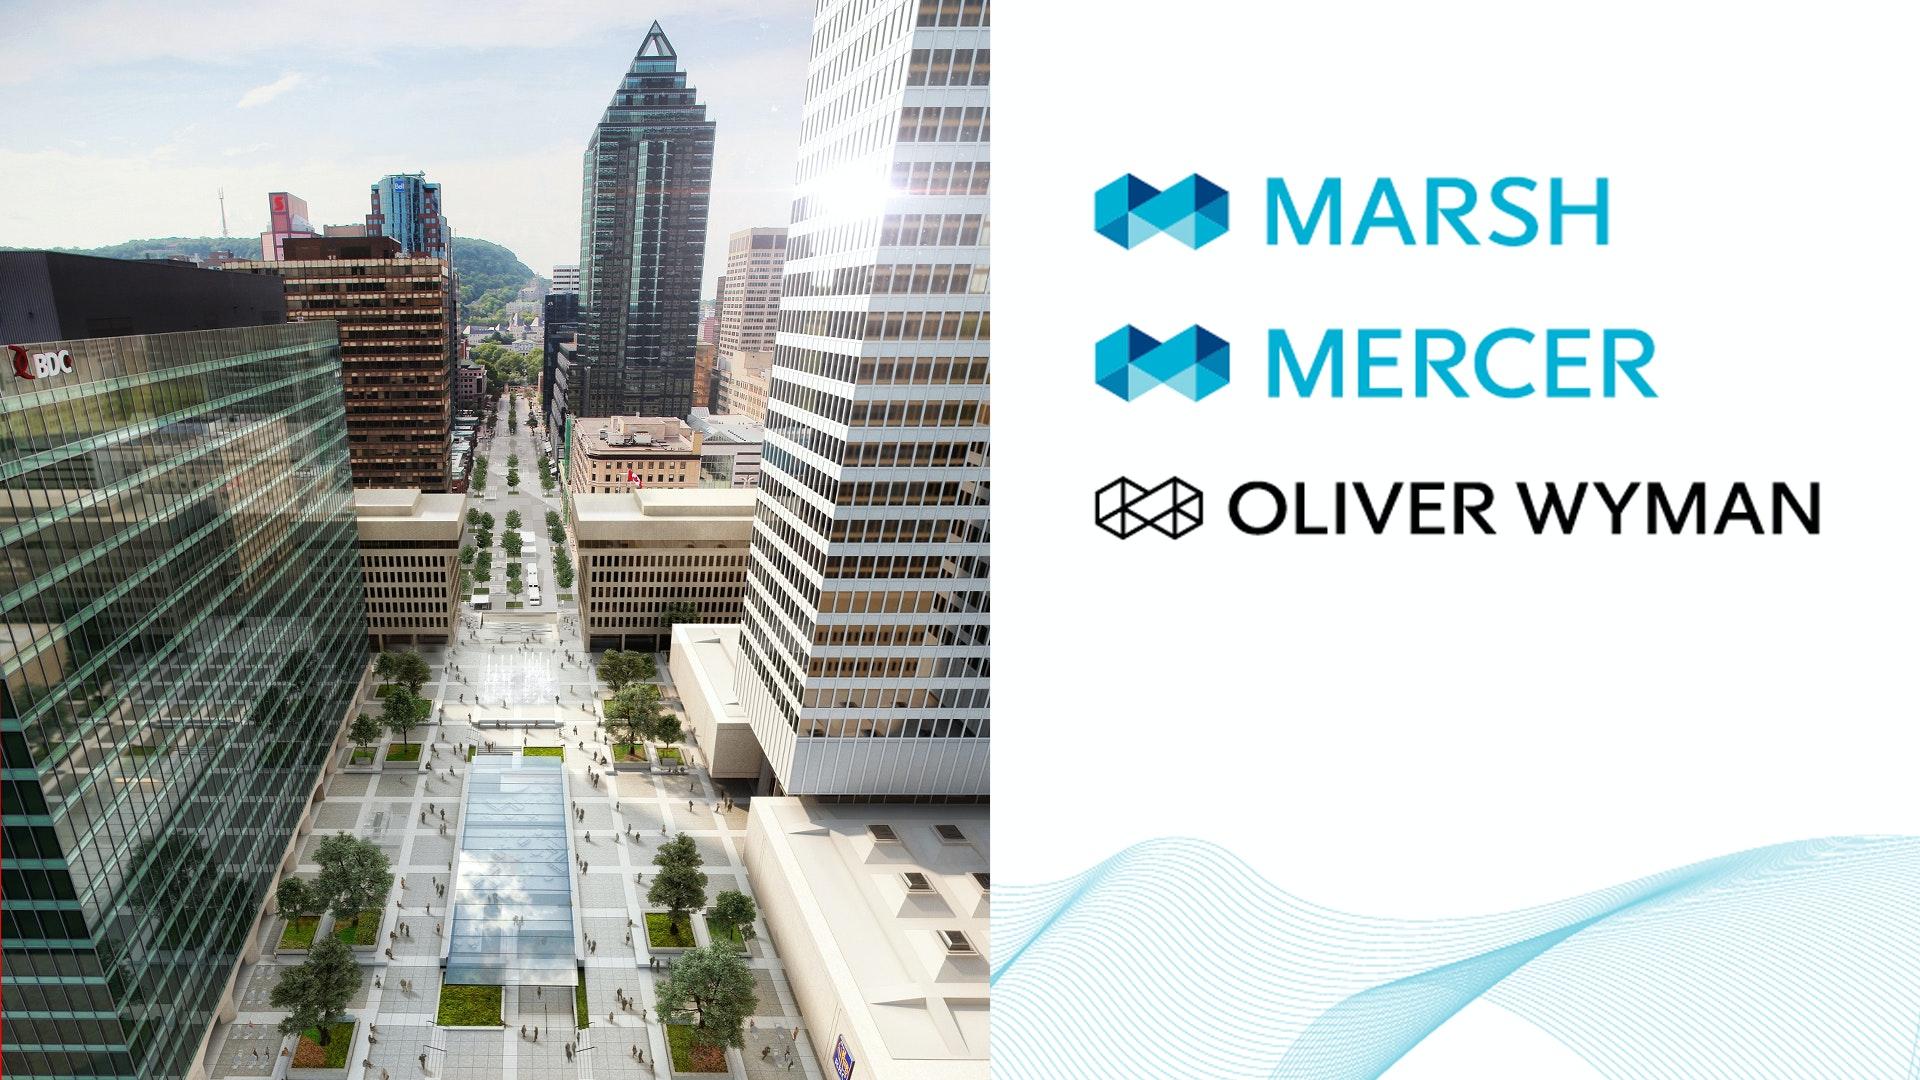 Marsh, Mercer et Oliver Wyman choisissent Place Ville Marie